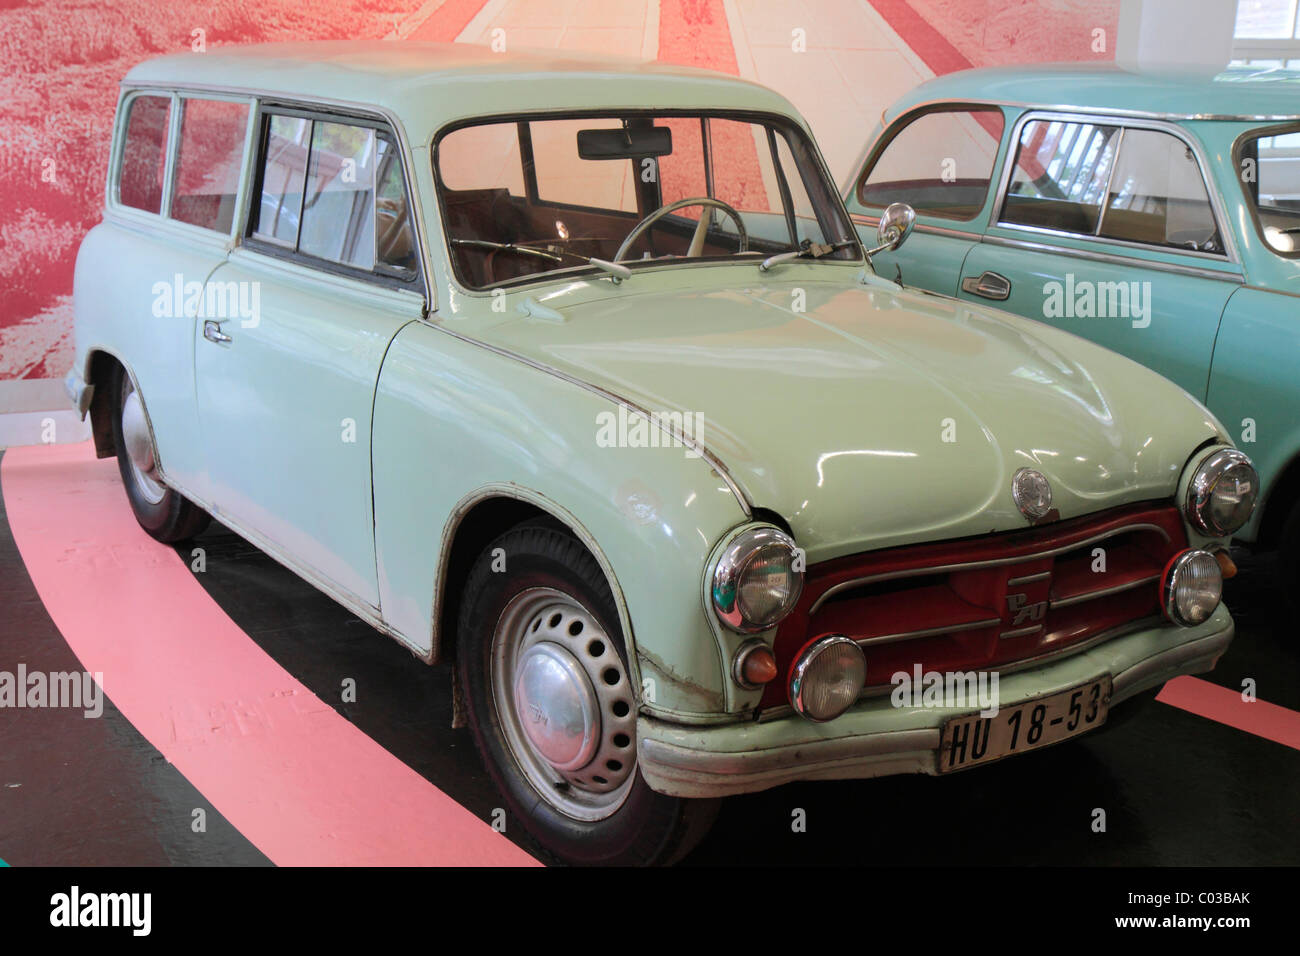 EEZ P 70 station wagon, GDR thermoset car, built in 1957, AWZ Zwickau, ErfinderZeiten car and clock museum in Schramberg - Stock Image